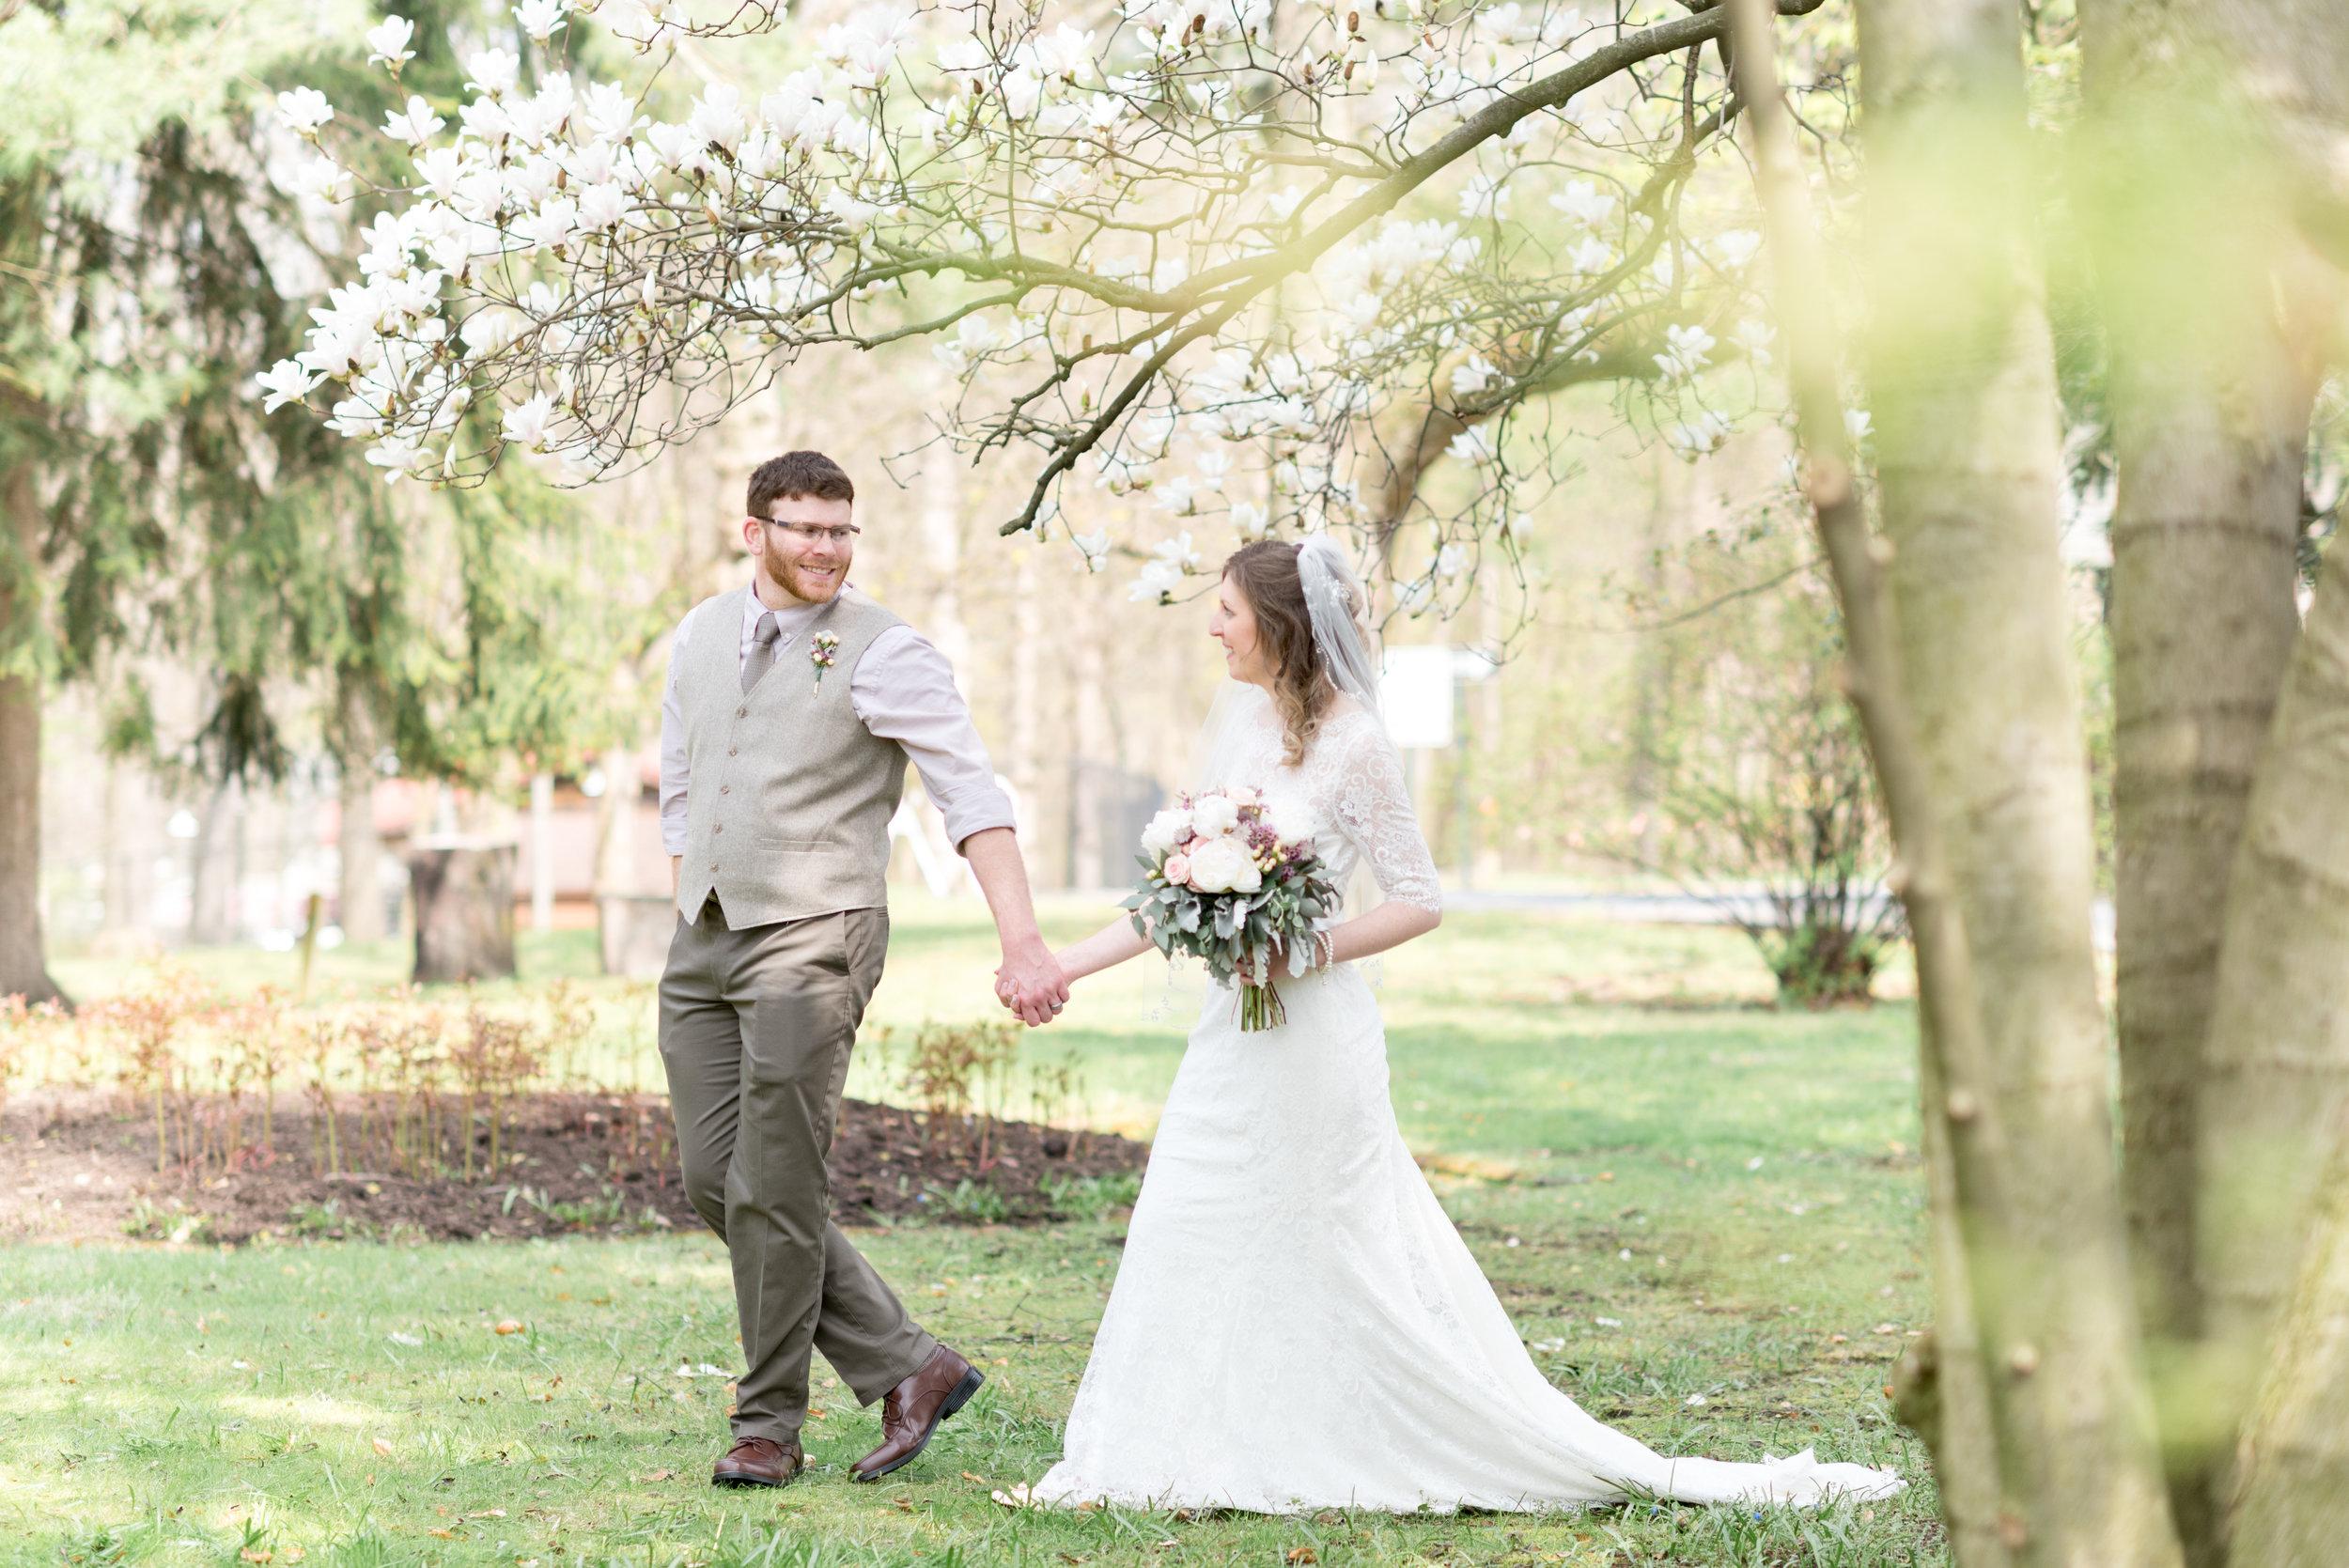 Bride-and-groom-walking-hand-in-hand-coleman-memorial-park-Lebanon-Wedding-Photograher